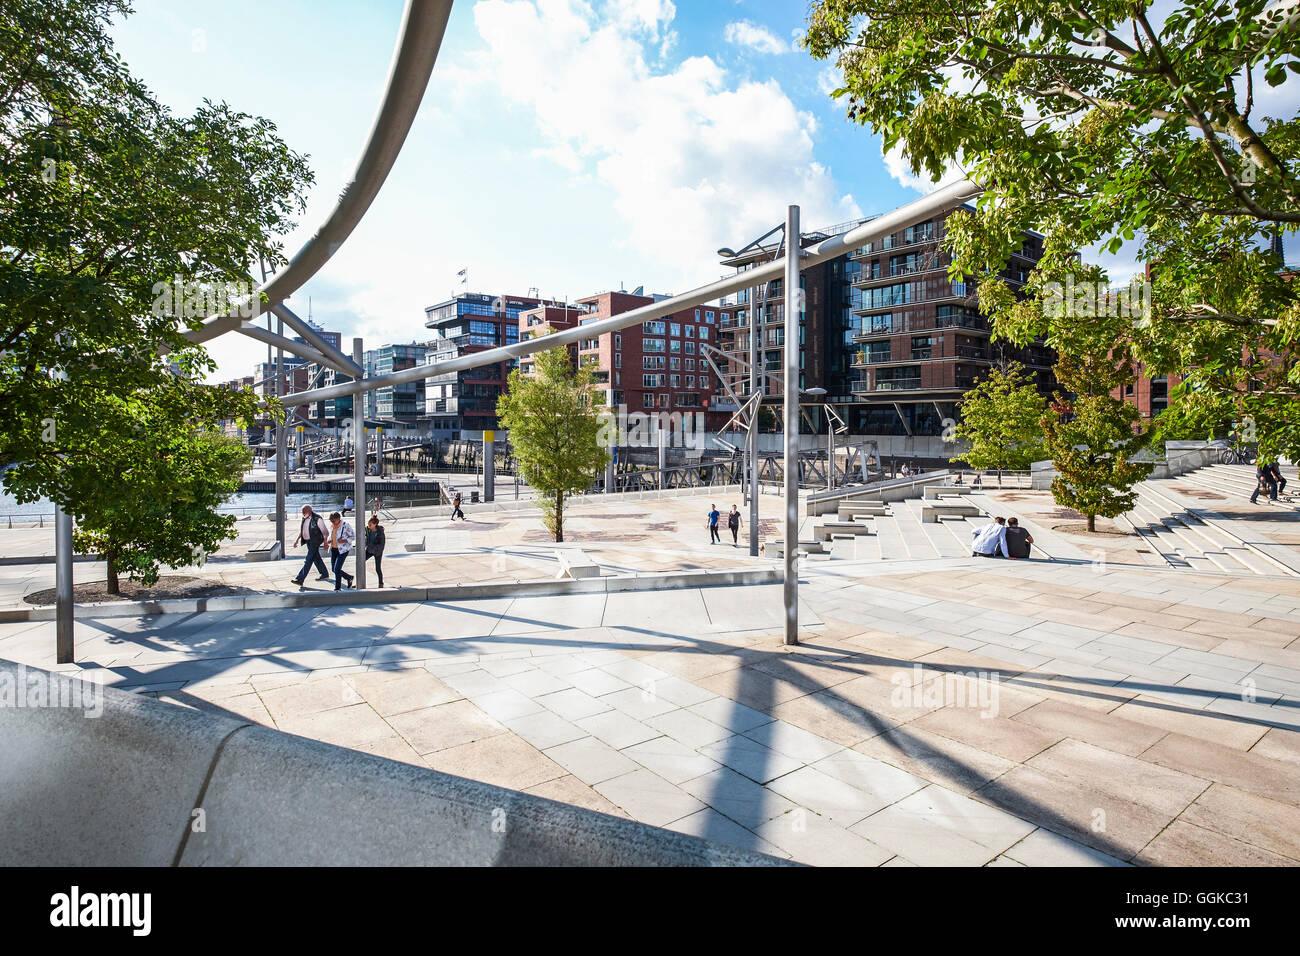 Magellan Terrace, HafenCity, Hamburg, Germany - Stock Image